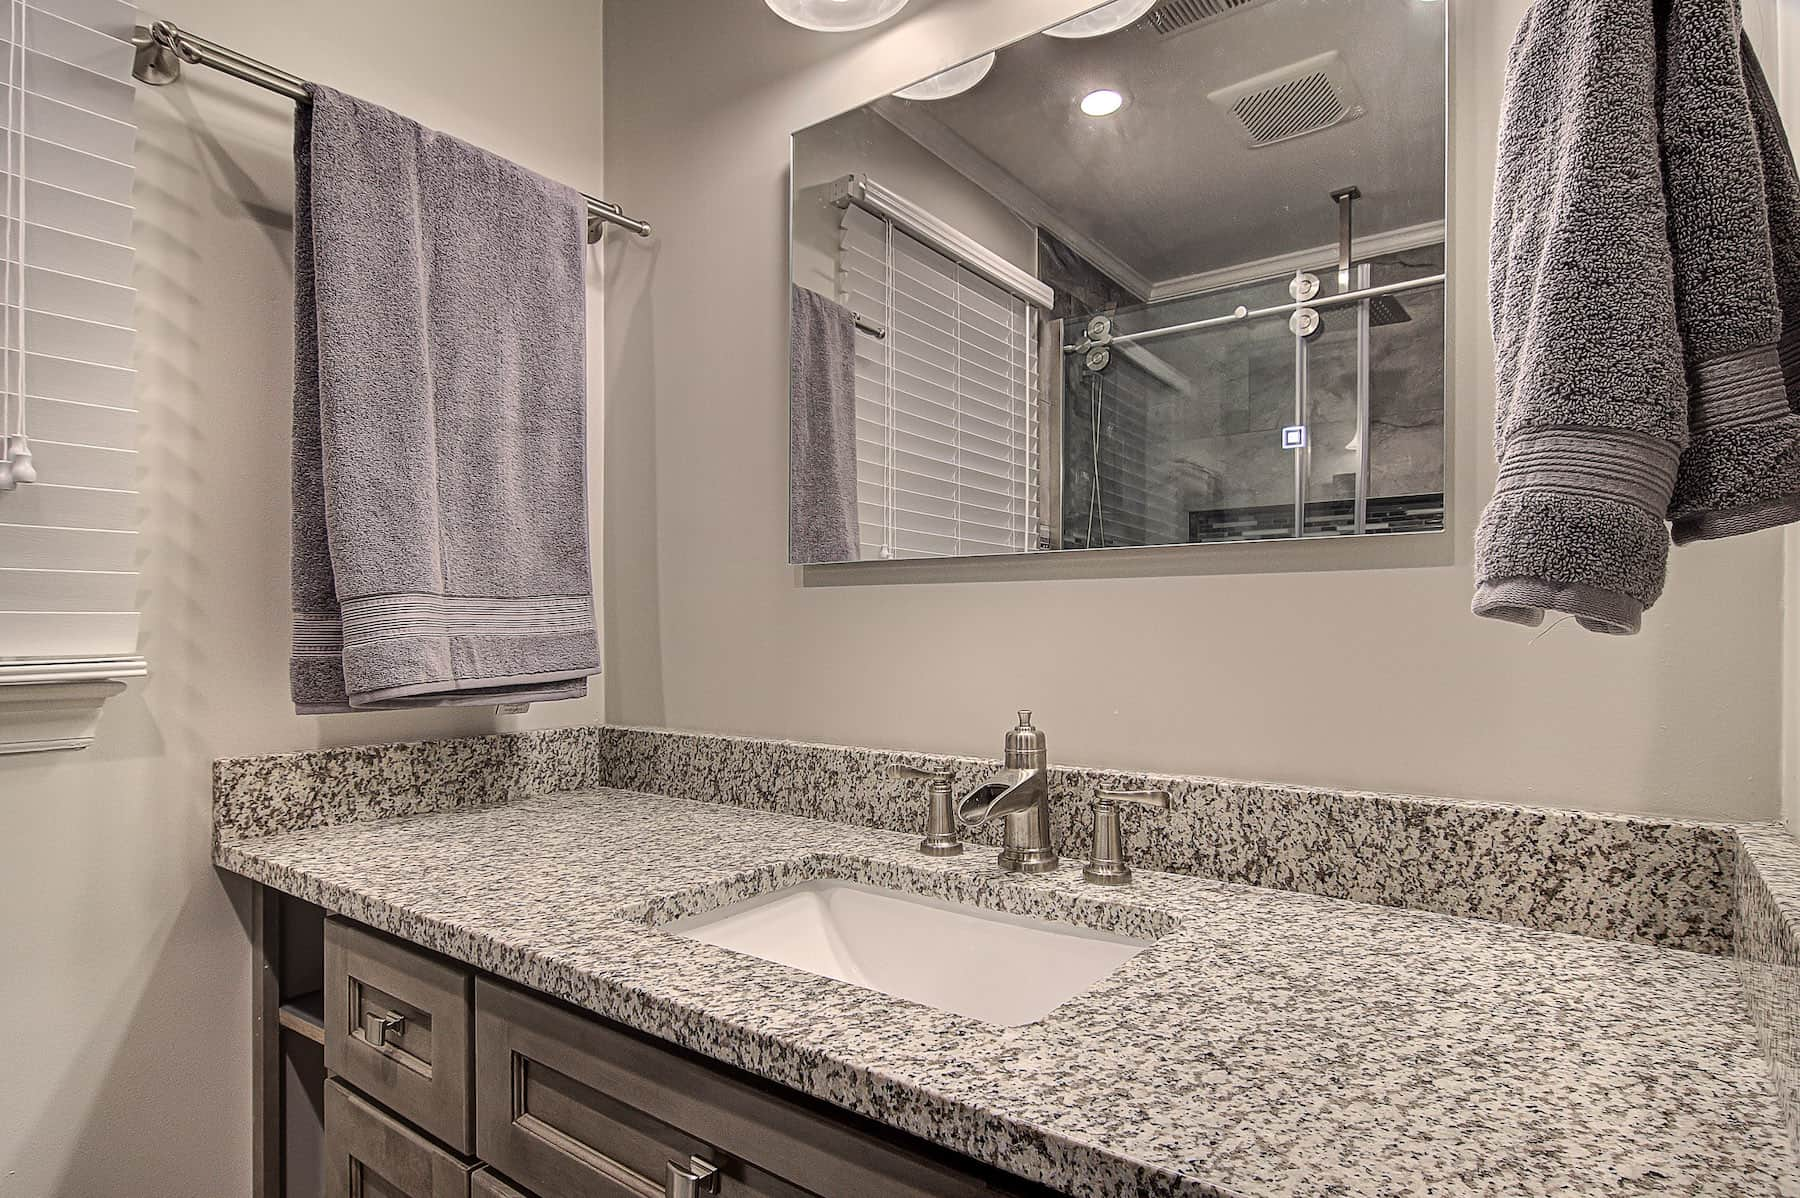 Bathroom Remodel Countertops & Cabinets Winston Salem NC